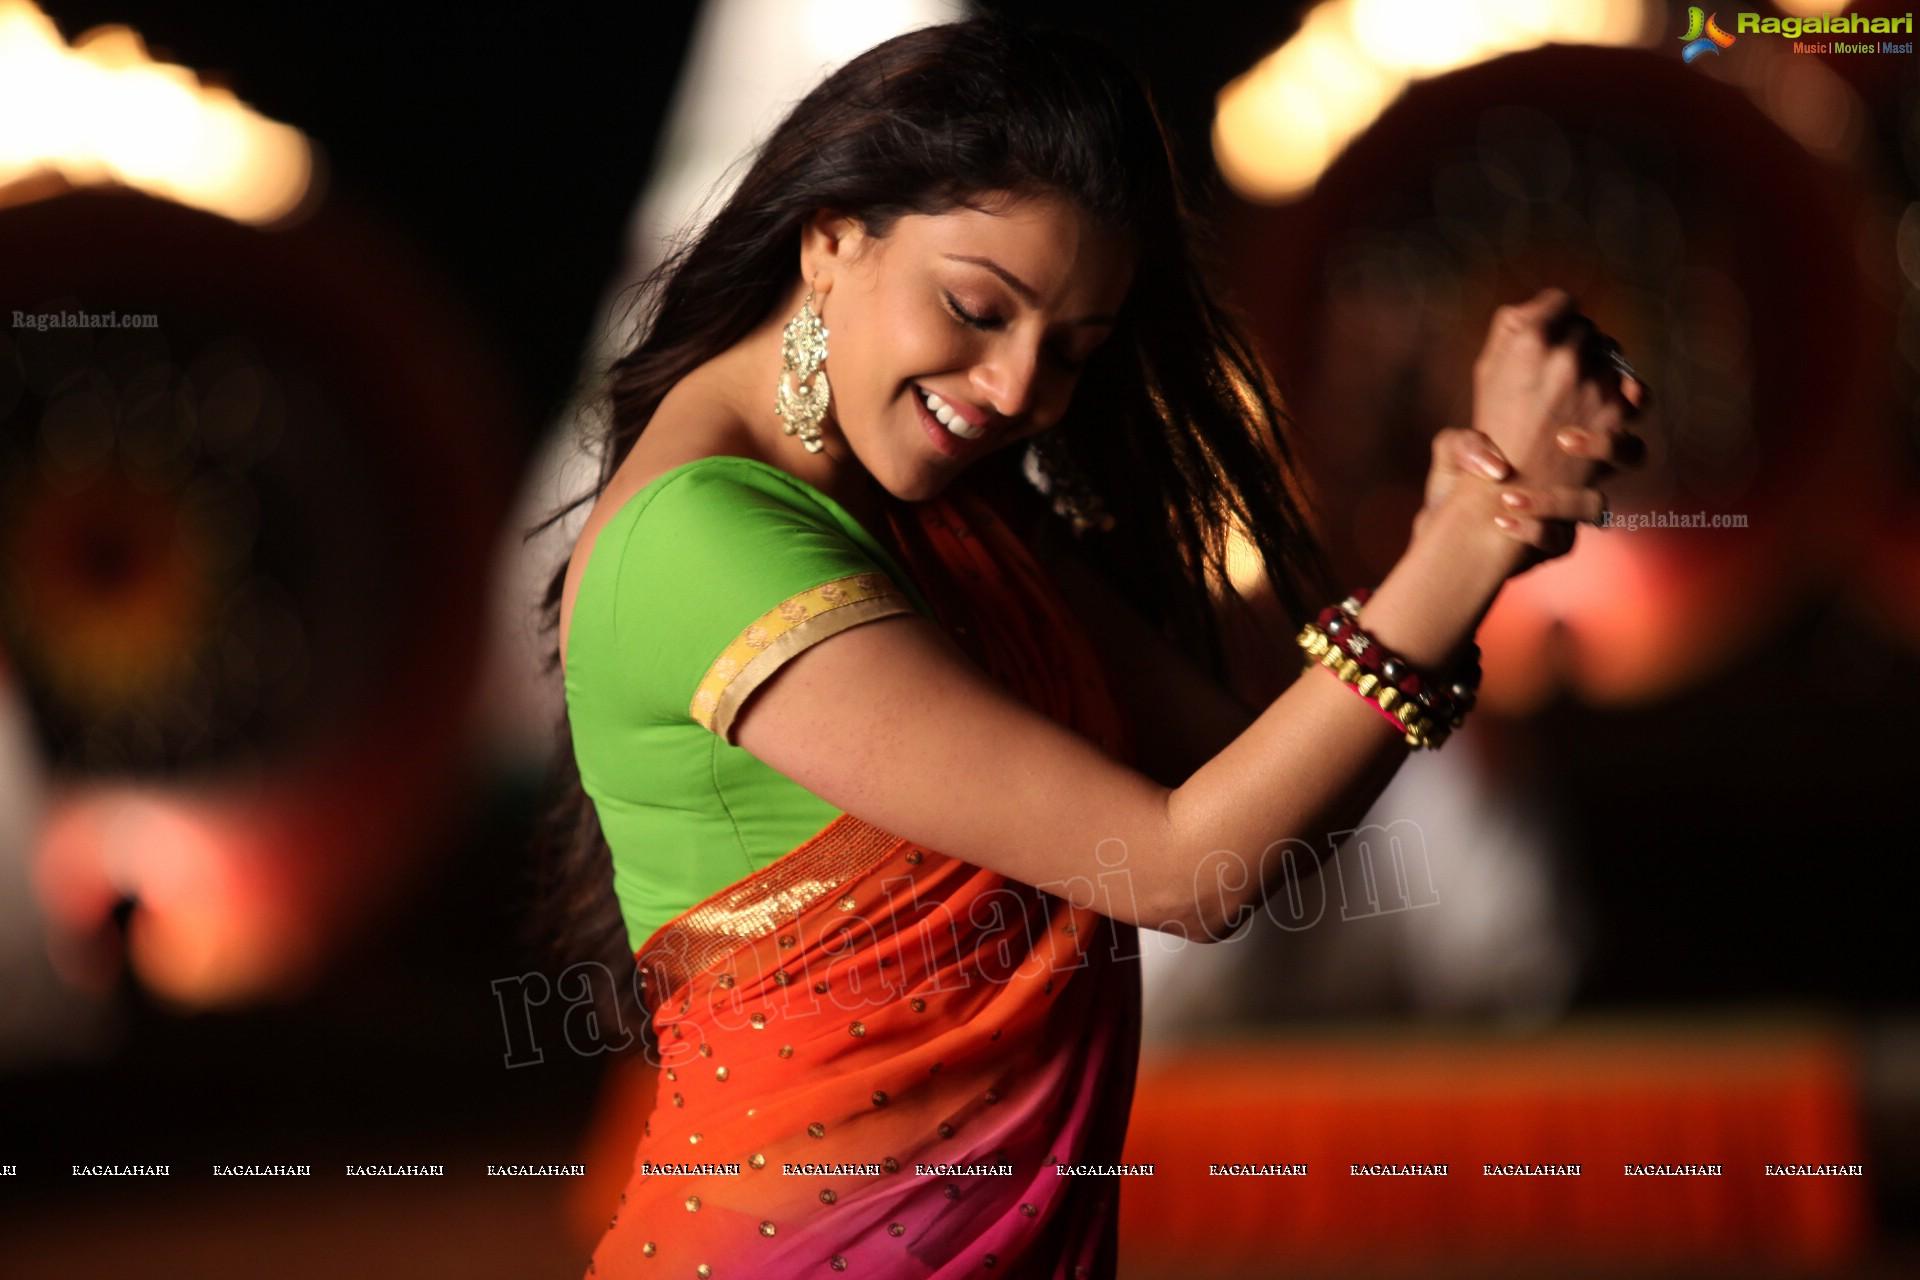 kajal agarwal (high definition) image 69 | tollywood heroines stills